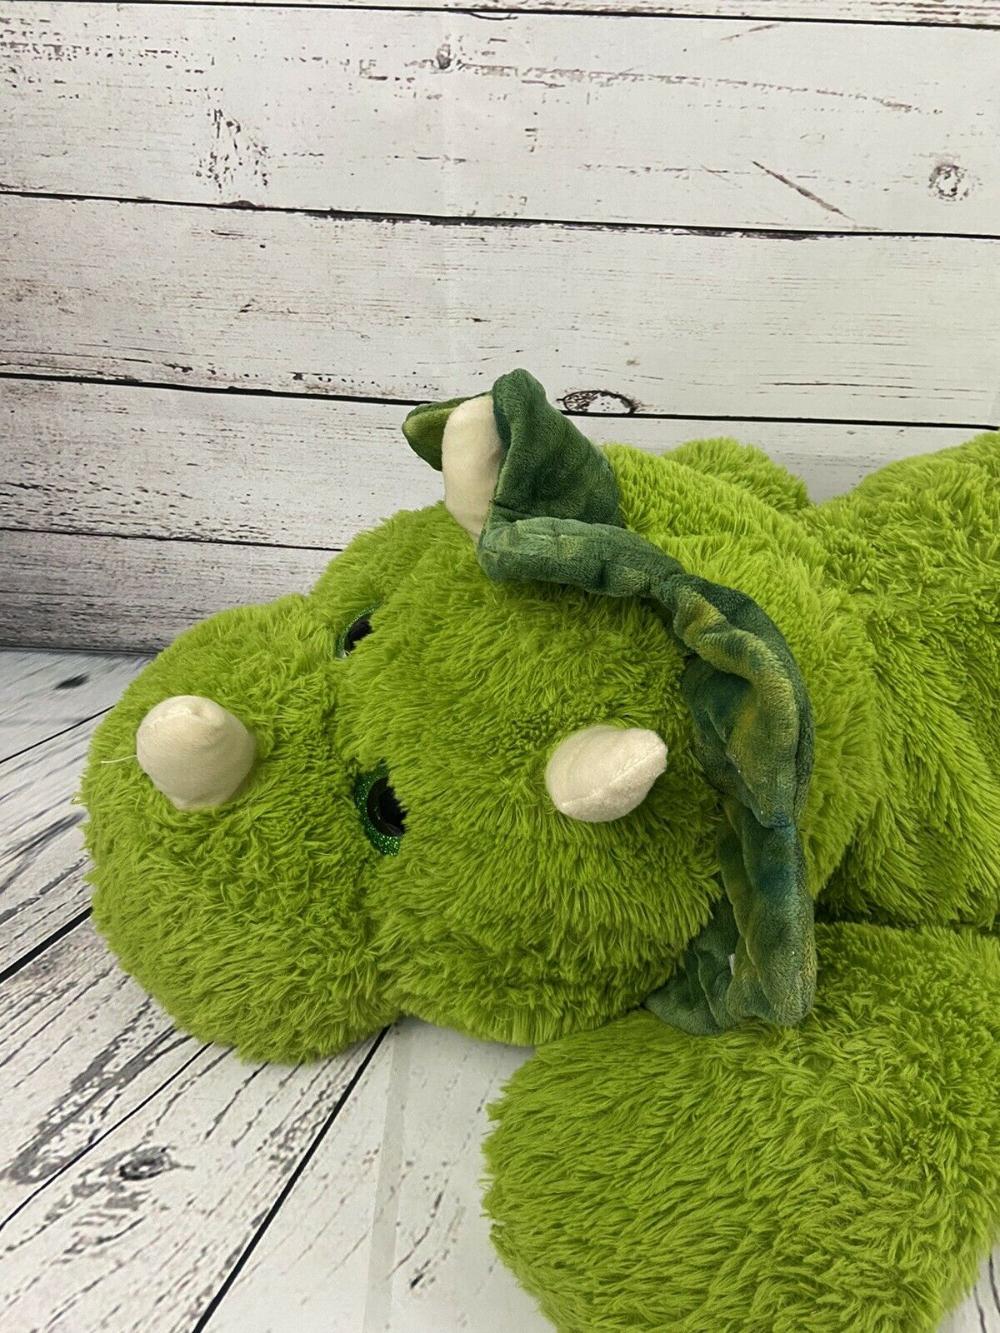 Jumbo Hugfun Green 44in Large Floppy Stuffed Animal Dinosaur Triceratops Plush Ebay Floppy Stuffed Animals Dinosaur Stuffed Animal Dinosaur Plush [ 1333 x 1000 Pixel ]